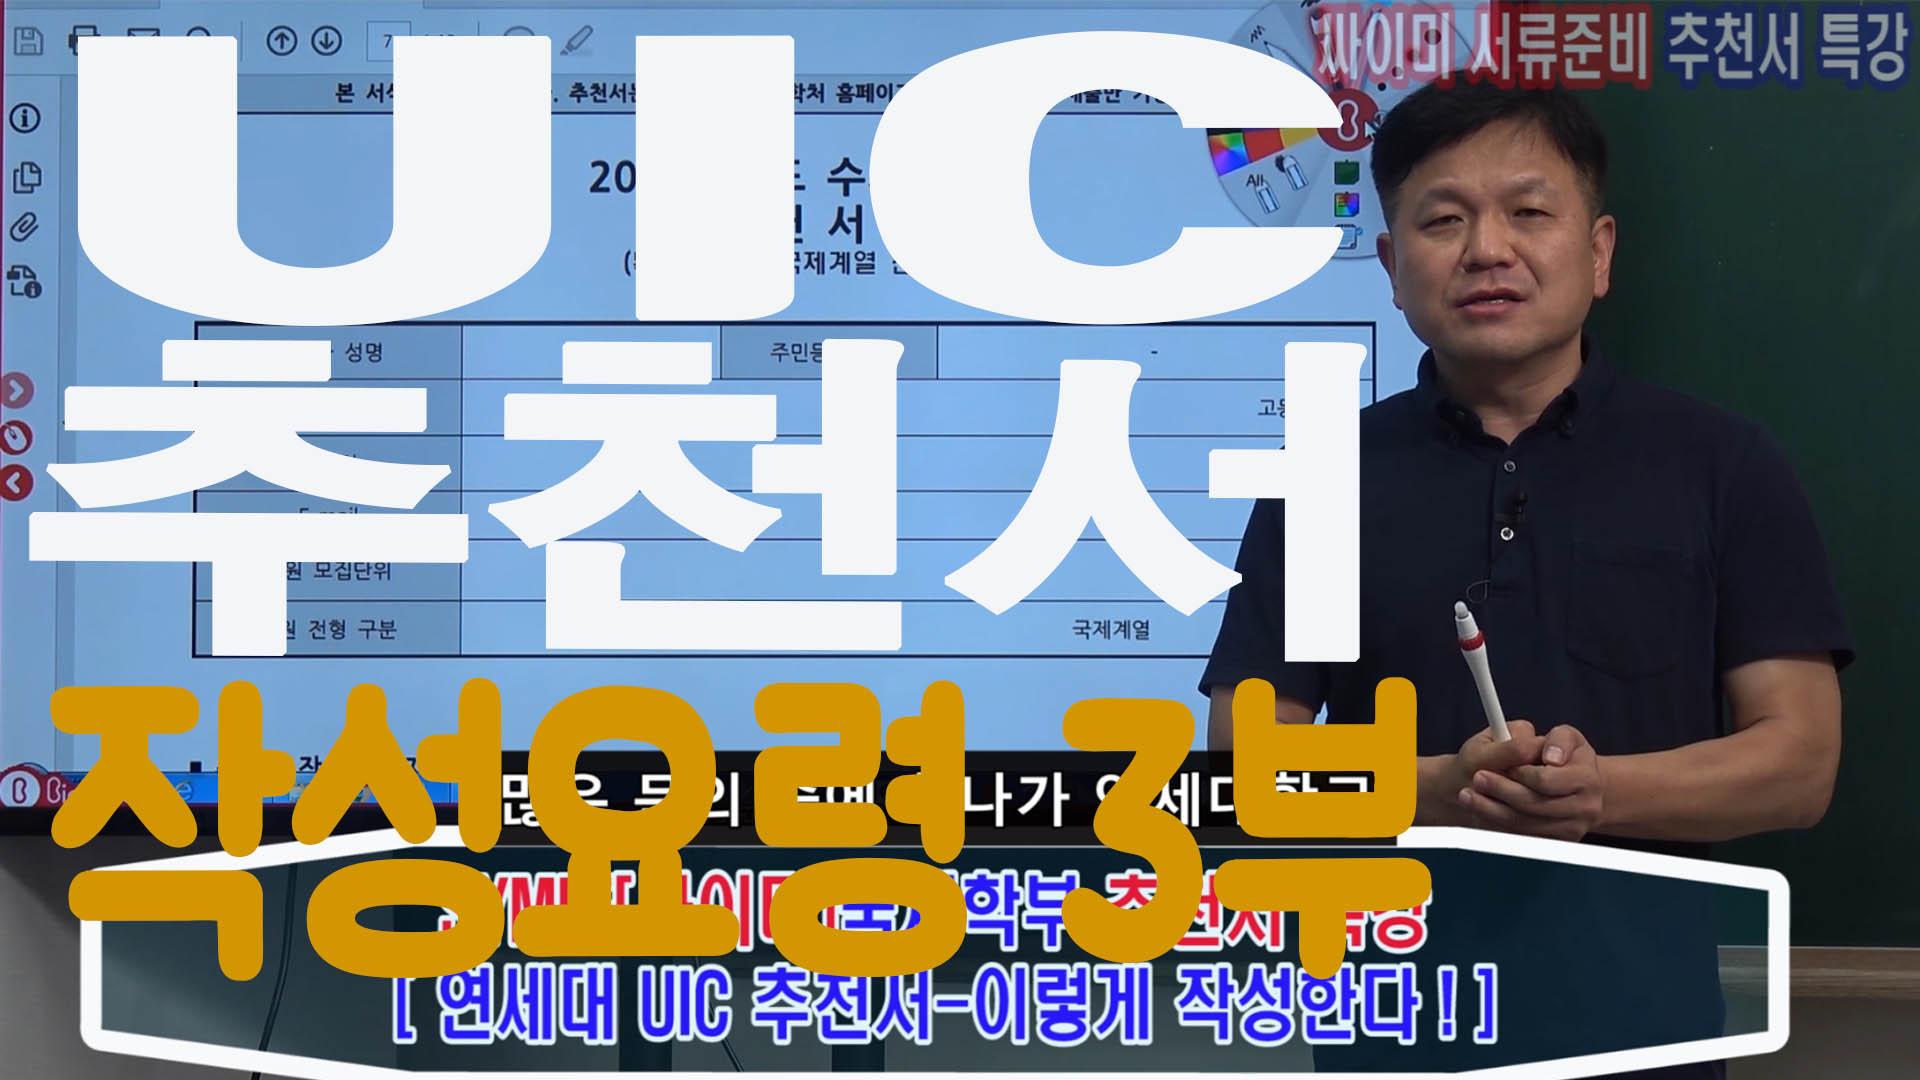 UIC_추천서_191216_1453_3부_썸네일1.jpg